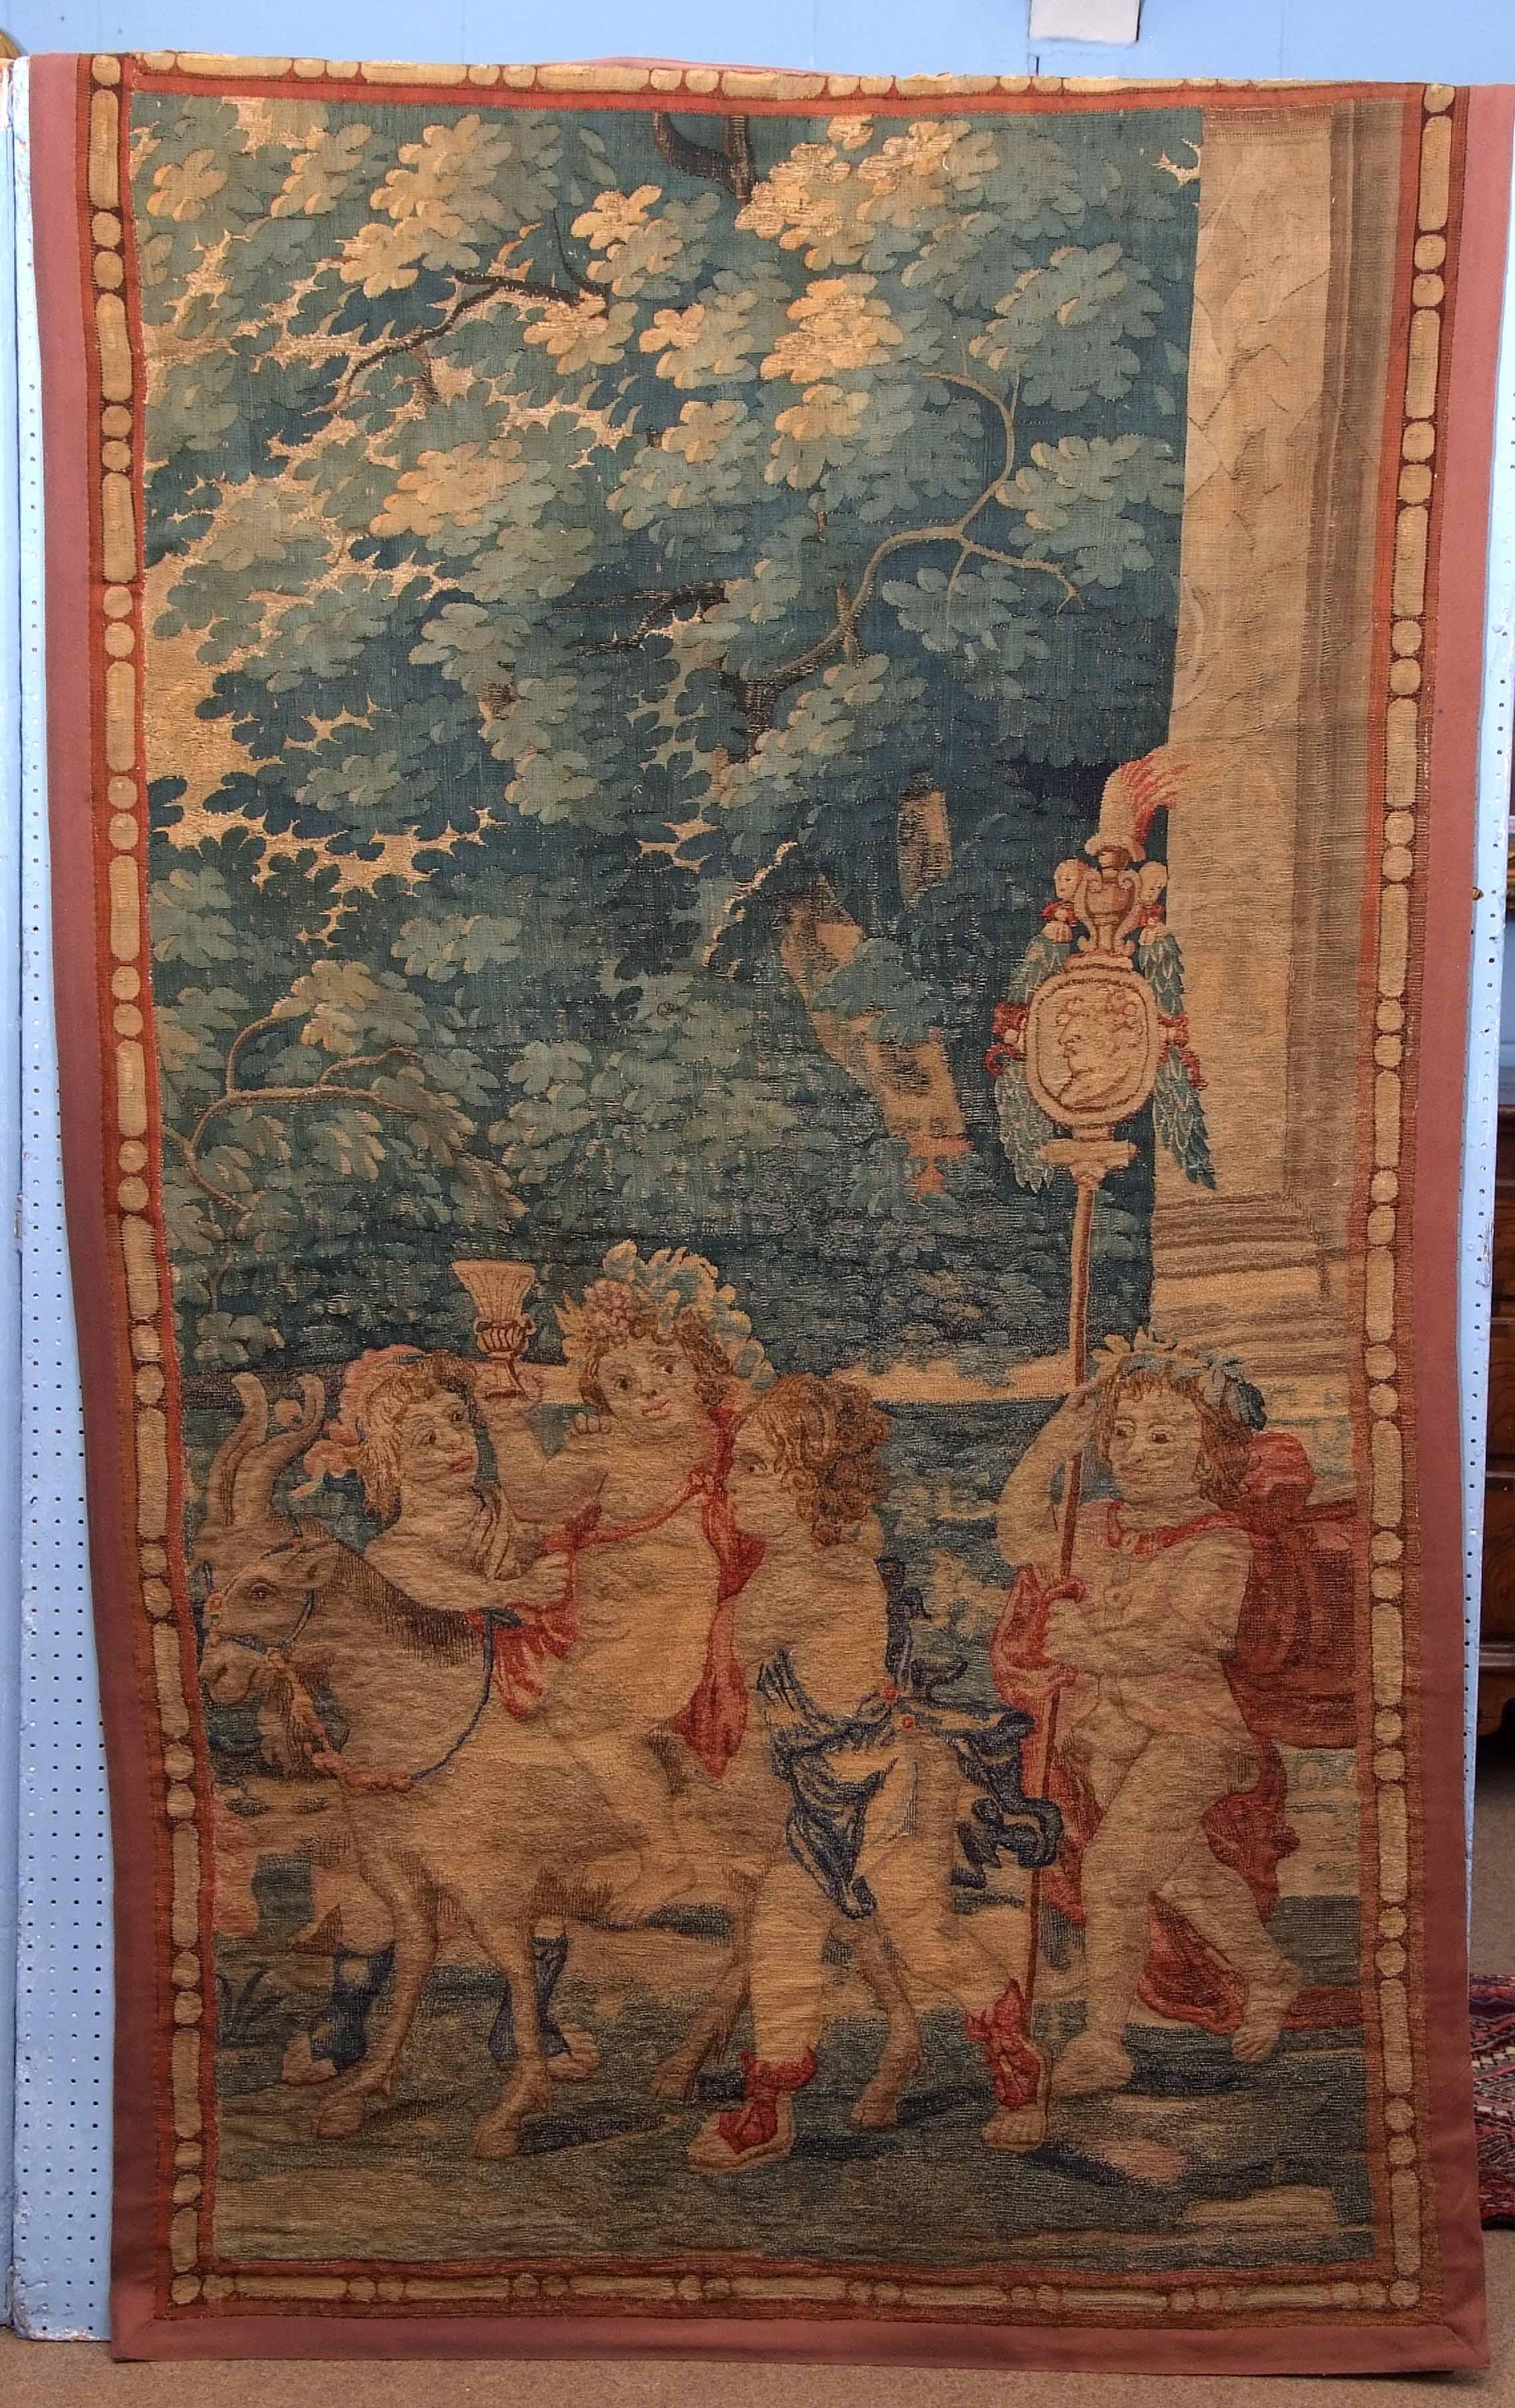 Lot 725 - 18th/19th century needlework tapestry, Bacchanalian Procession, 190 x 115cm